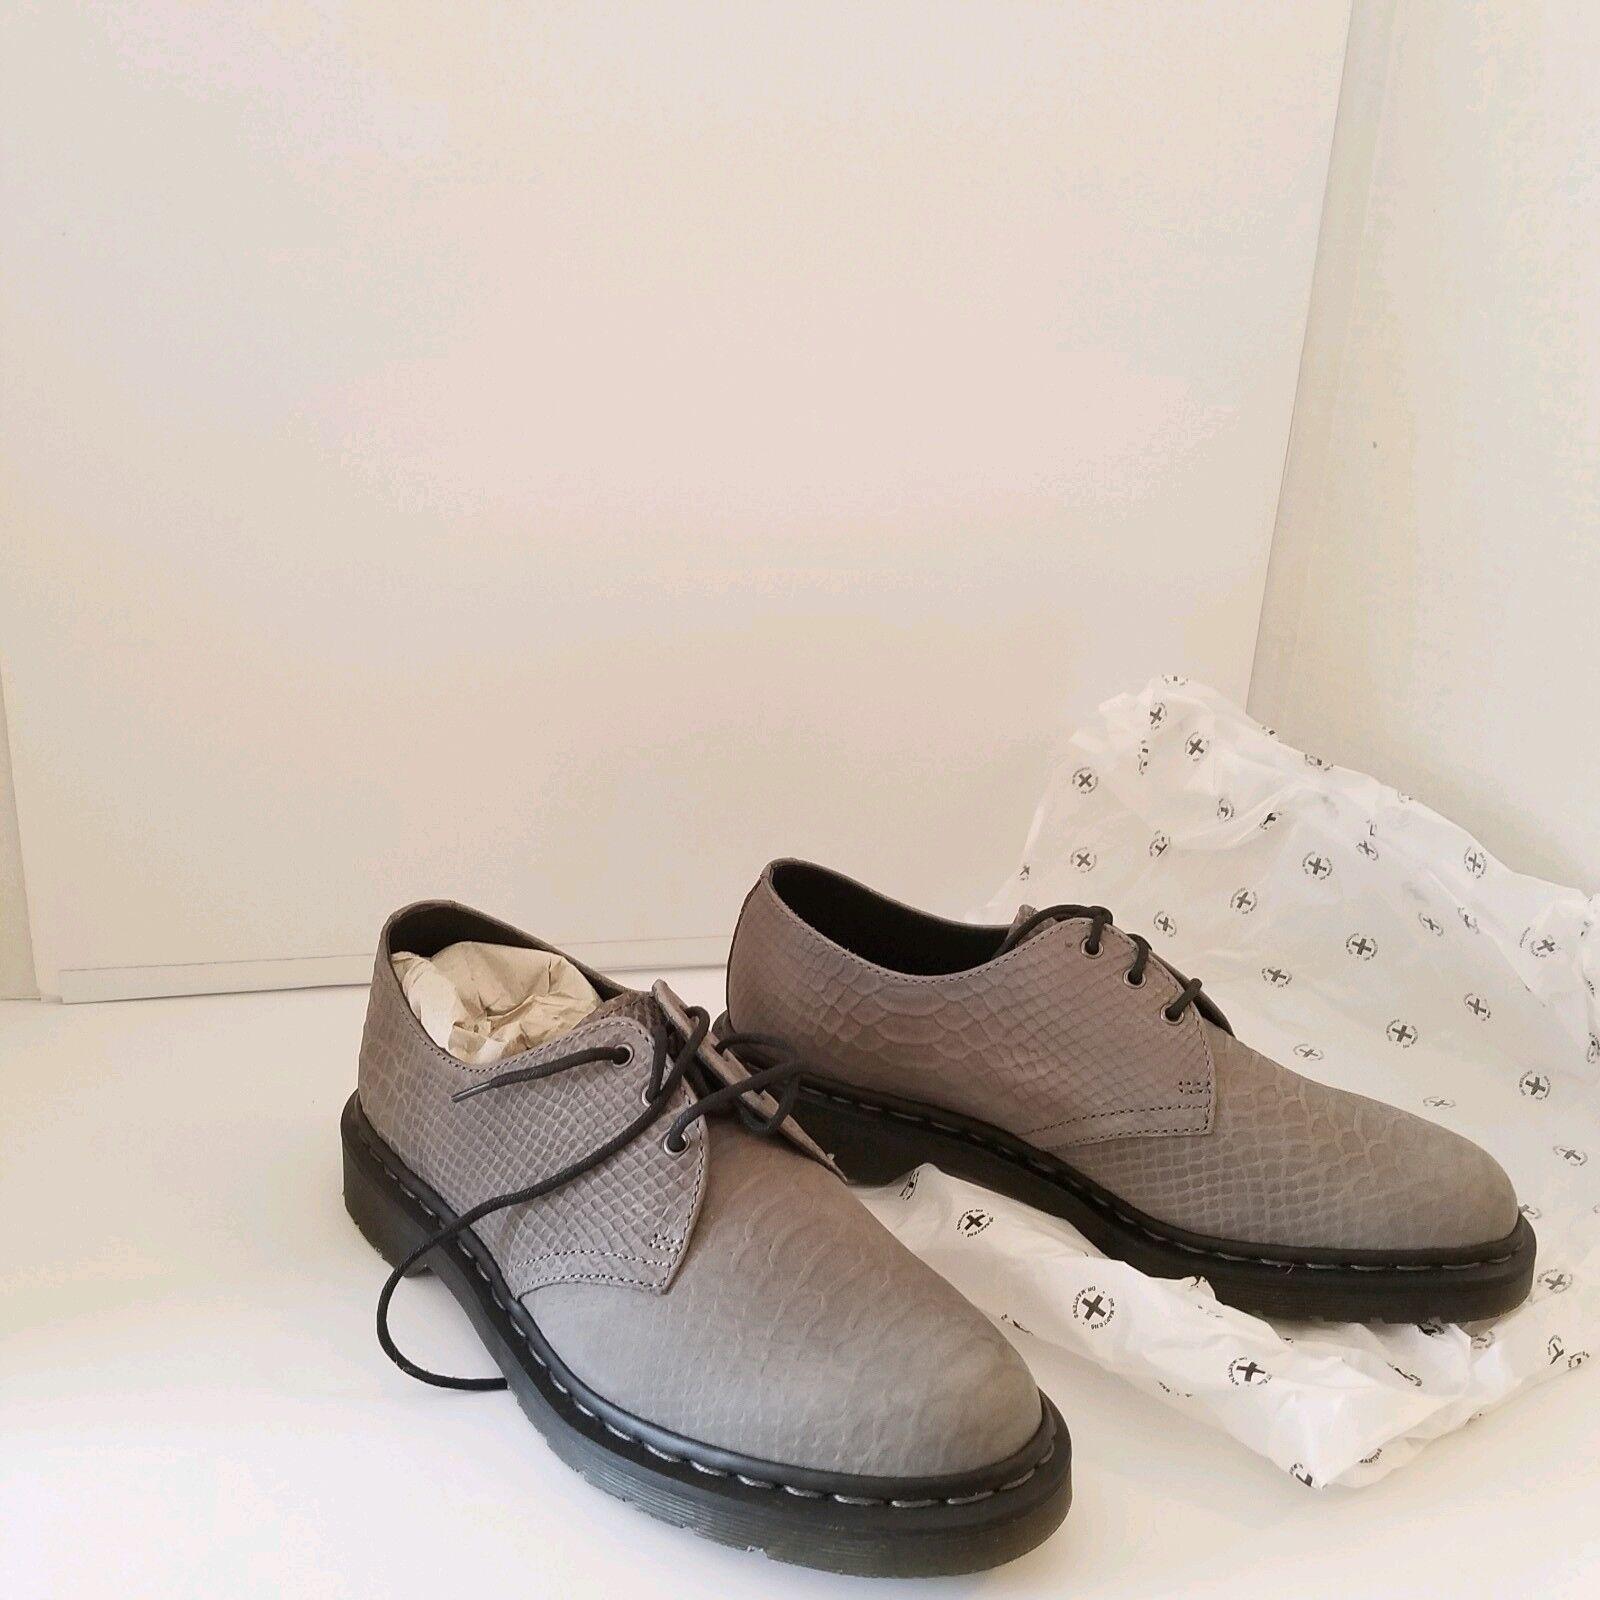 Dr Martens 1461 Python Grey 14482021 3 Hole shoes UK9 US10